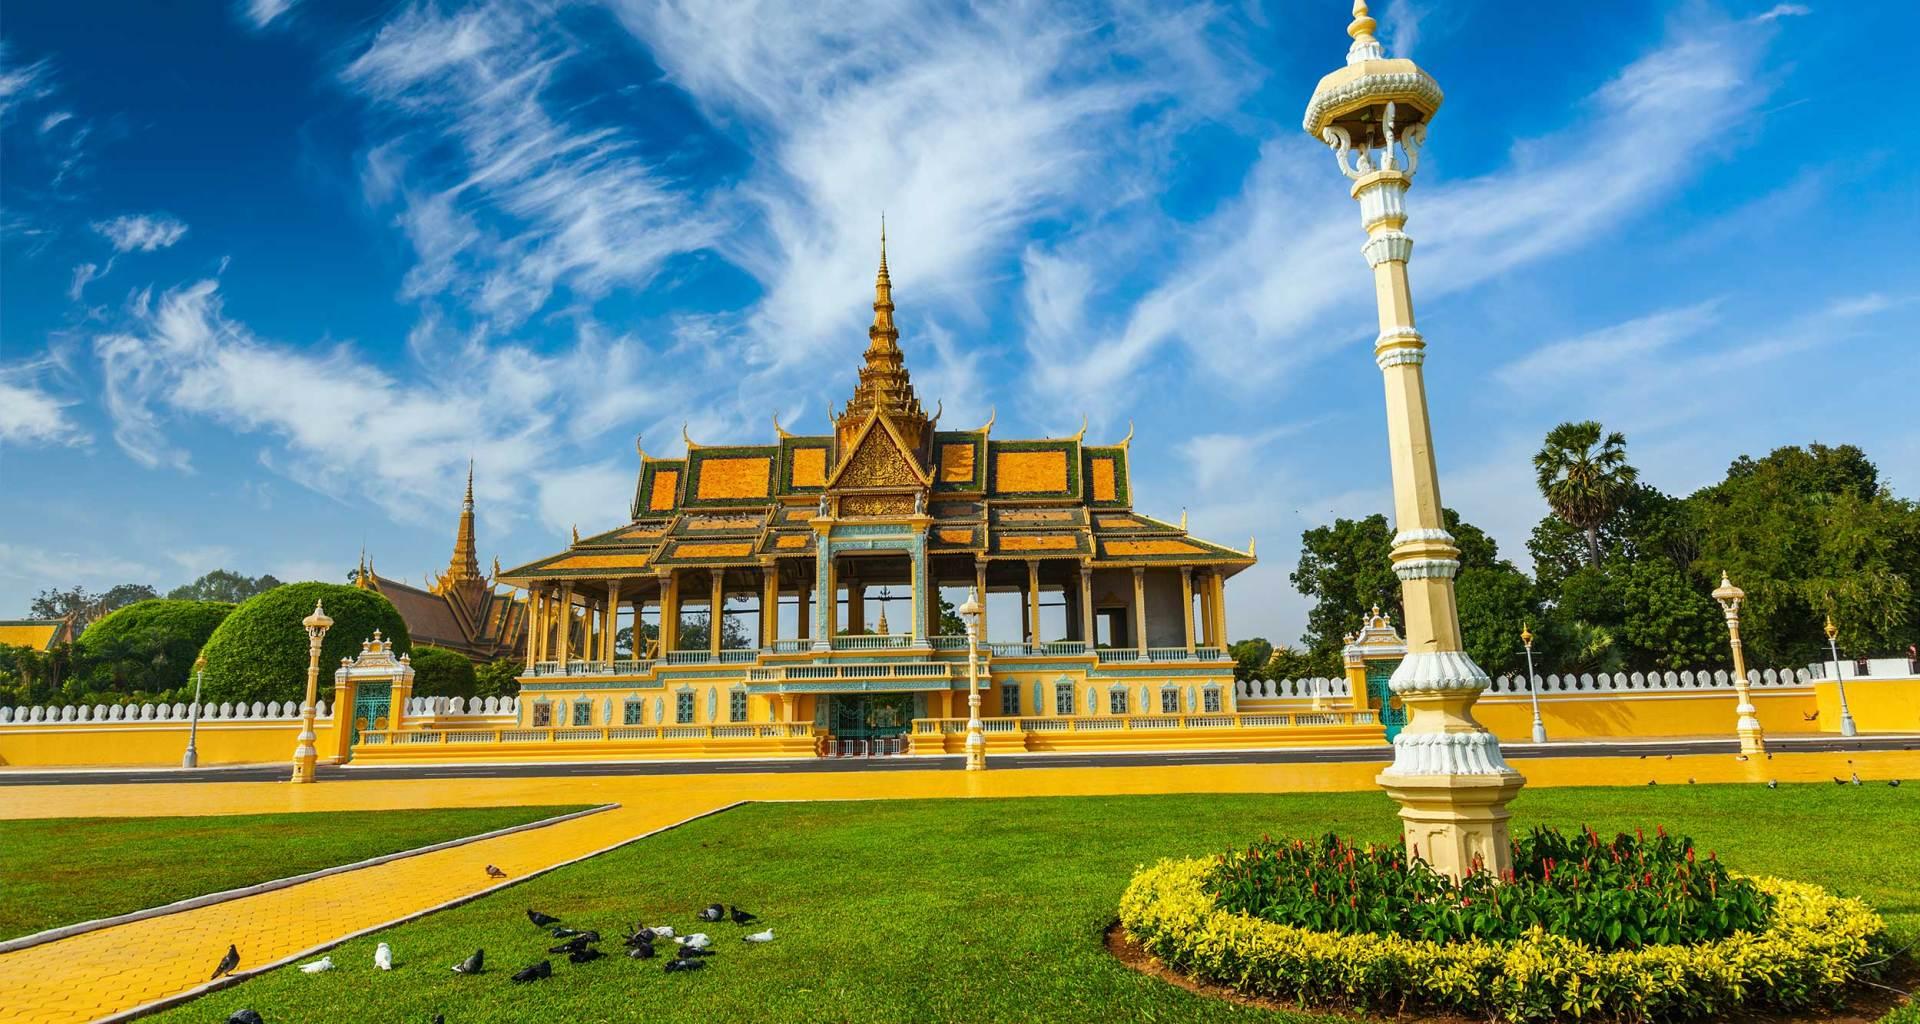 Phnom Penh, Cambodia skyline.